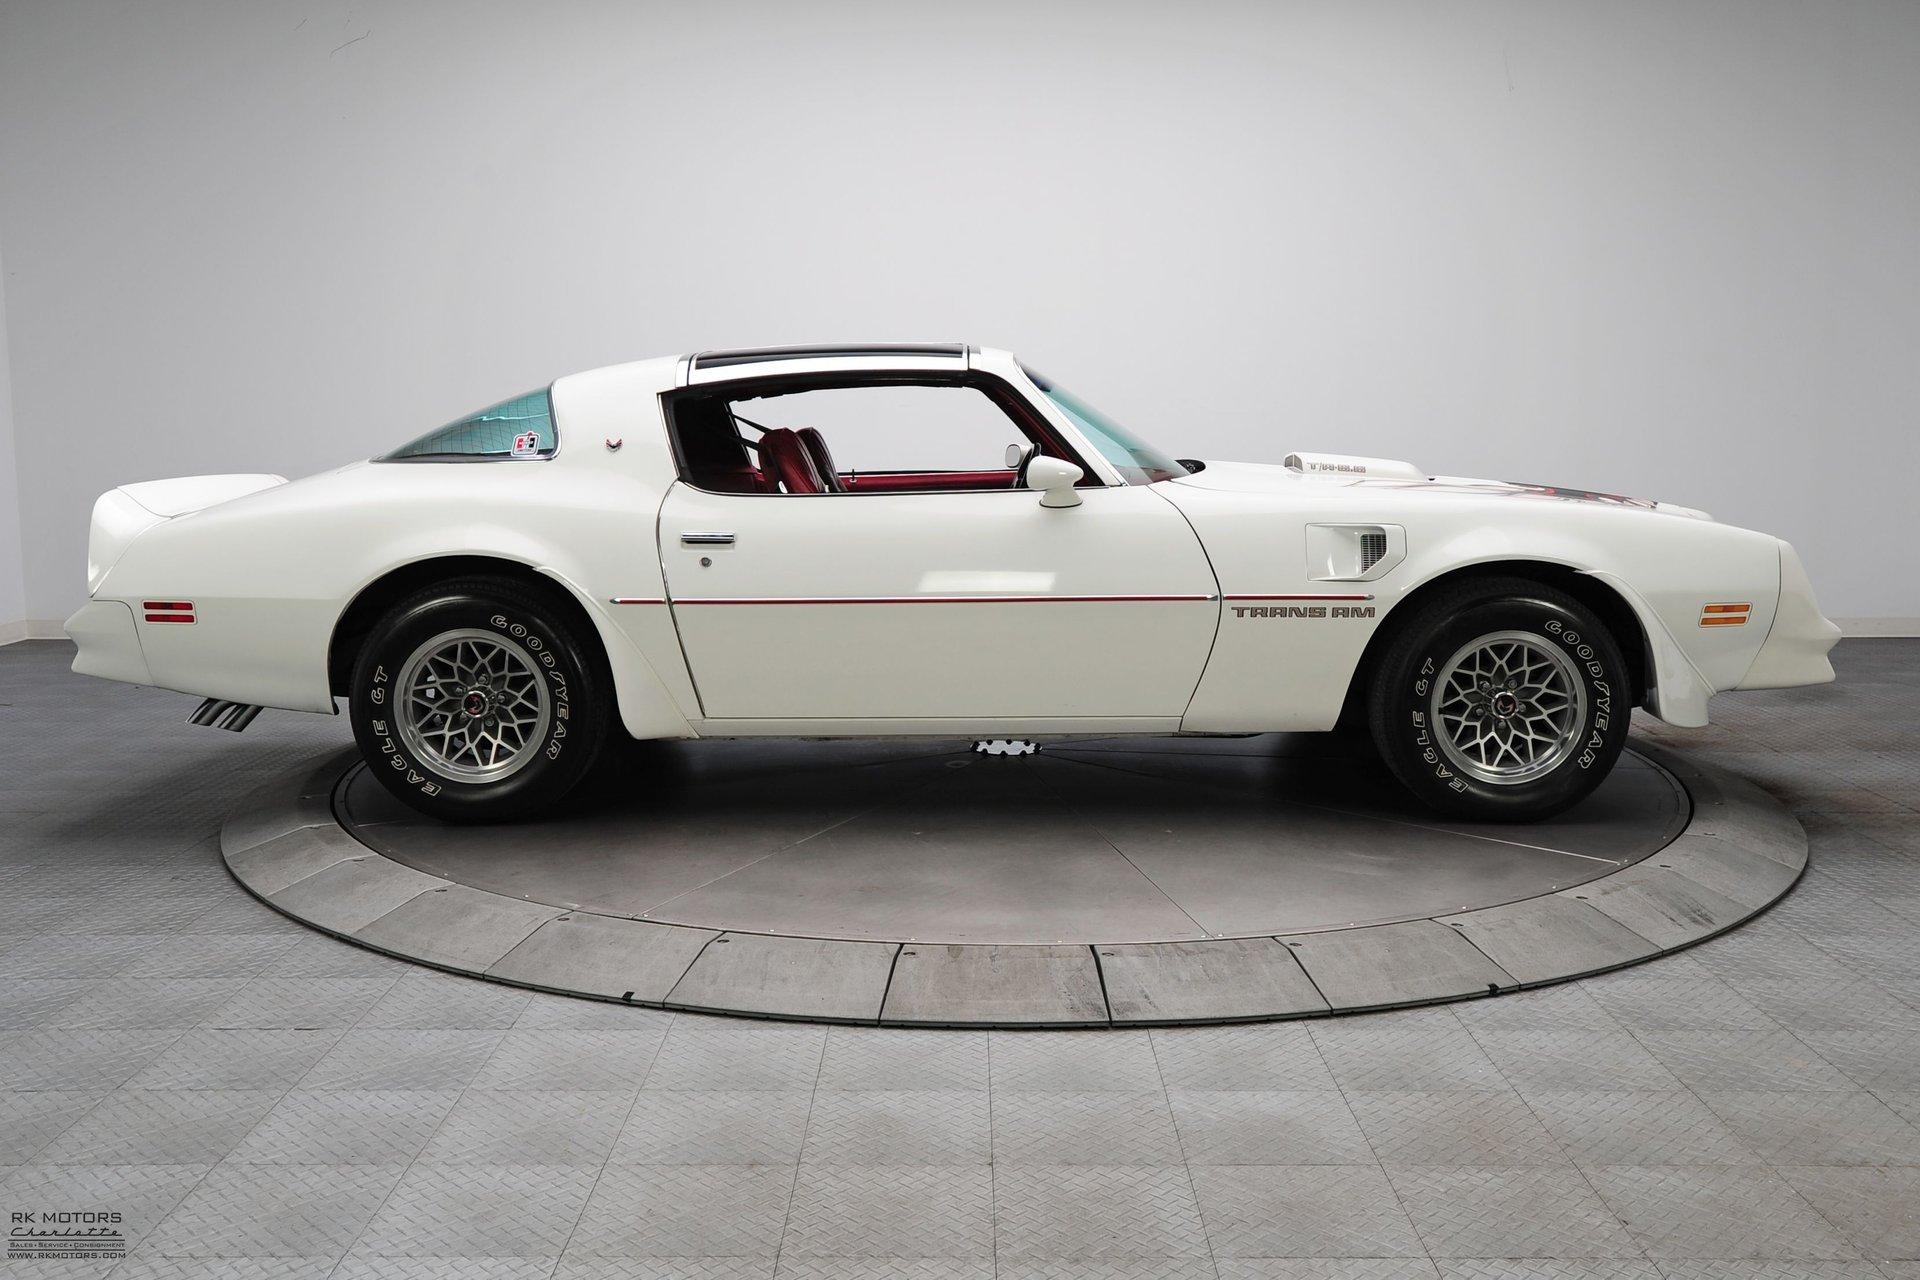 132854 1978 Pontiac Firebird RK Motors Classic Cars for Sale